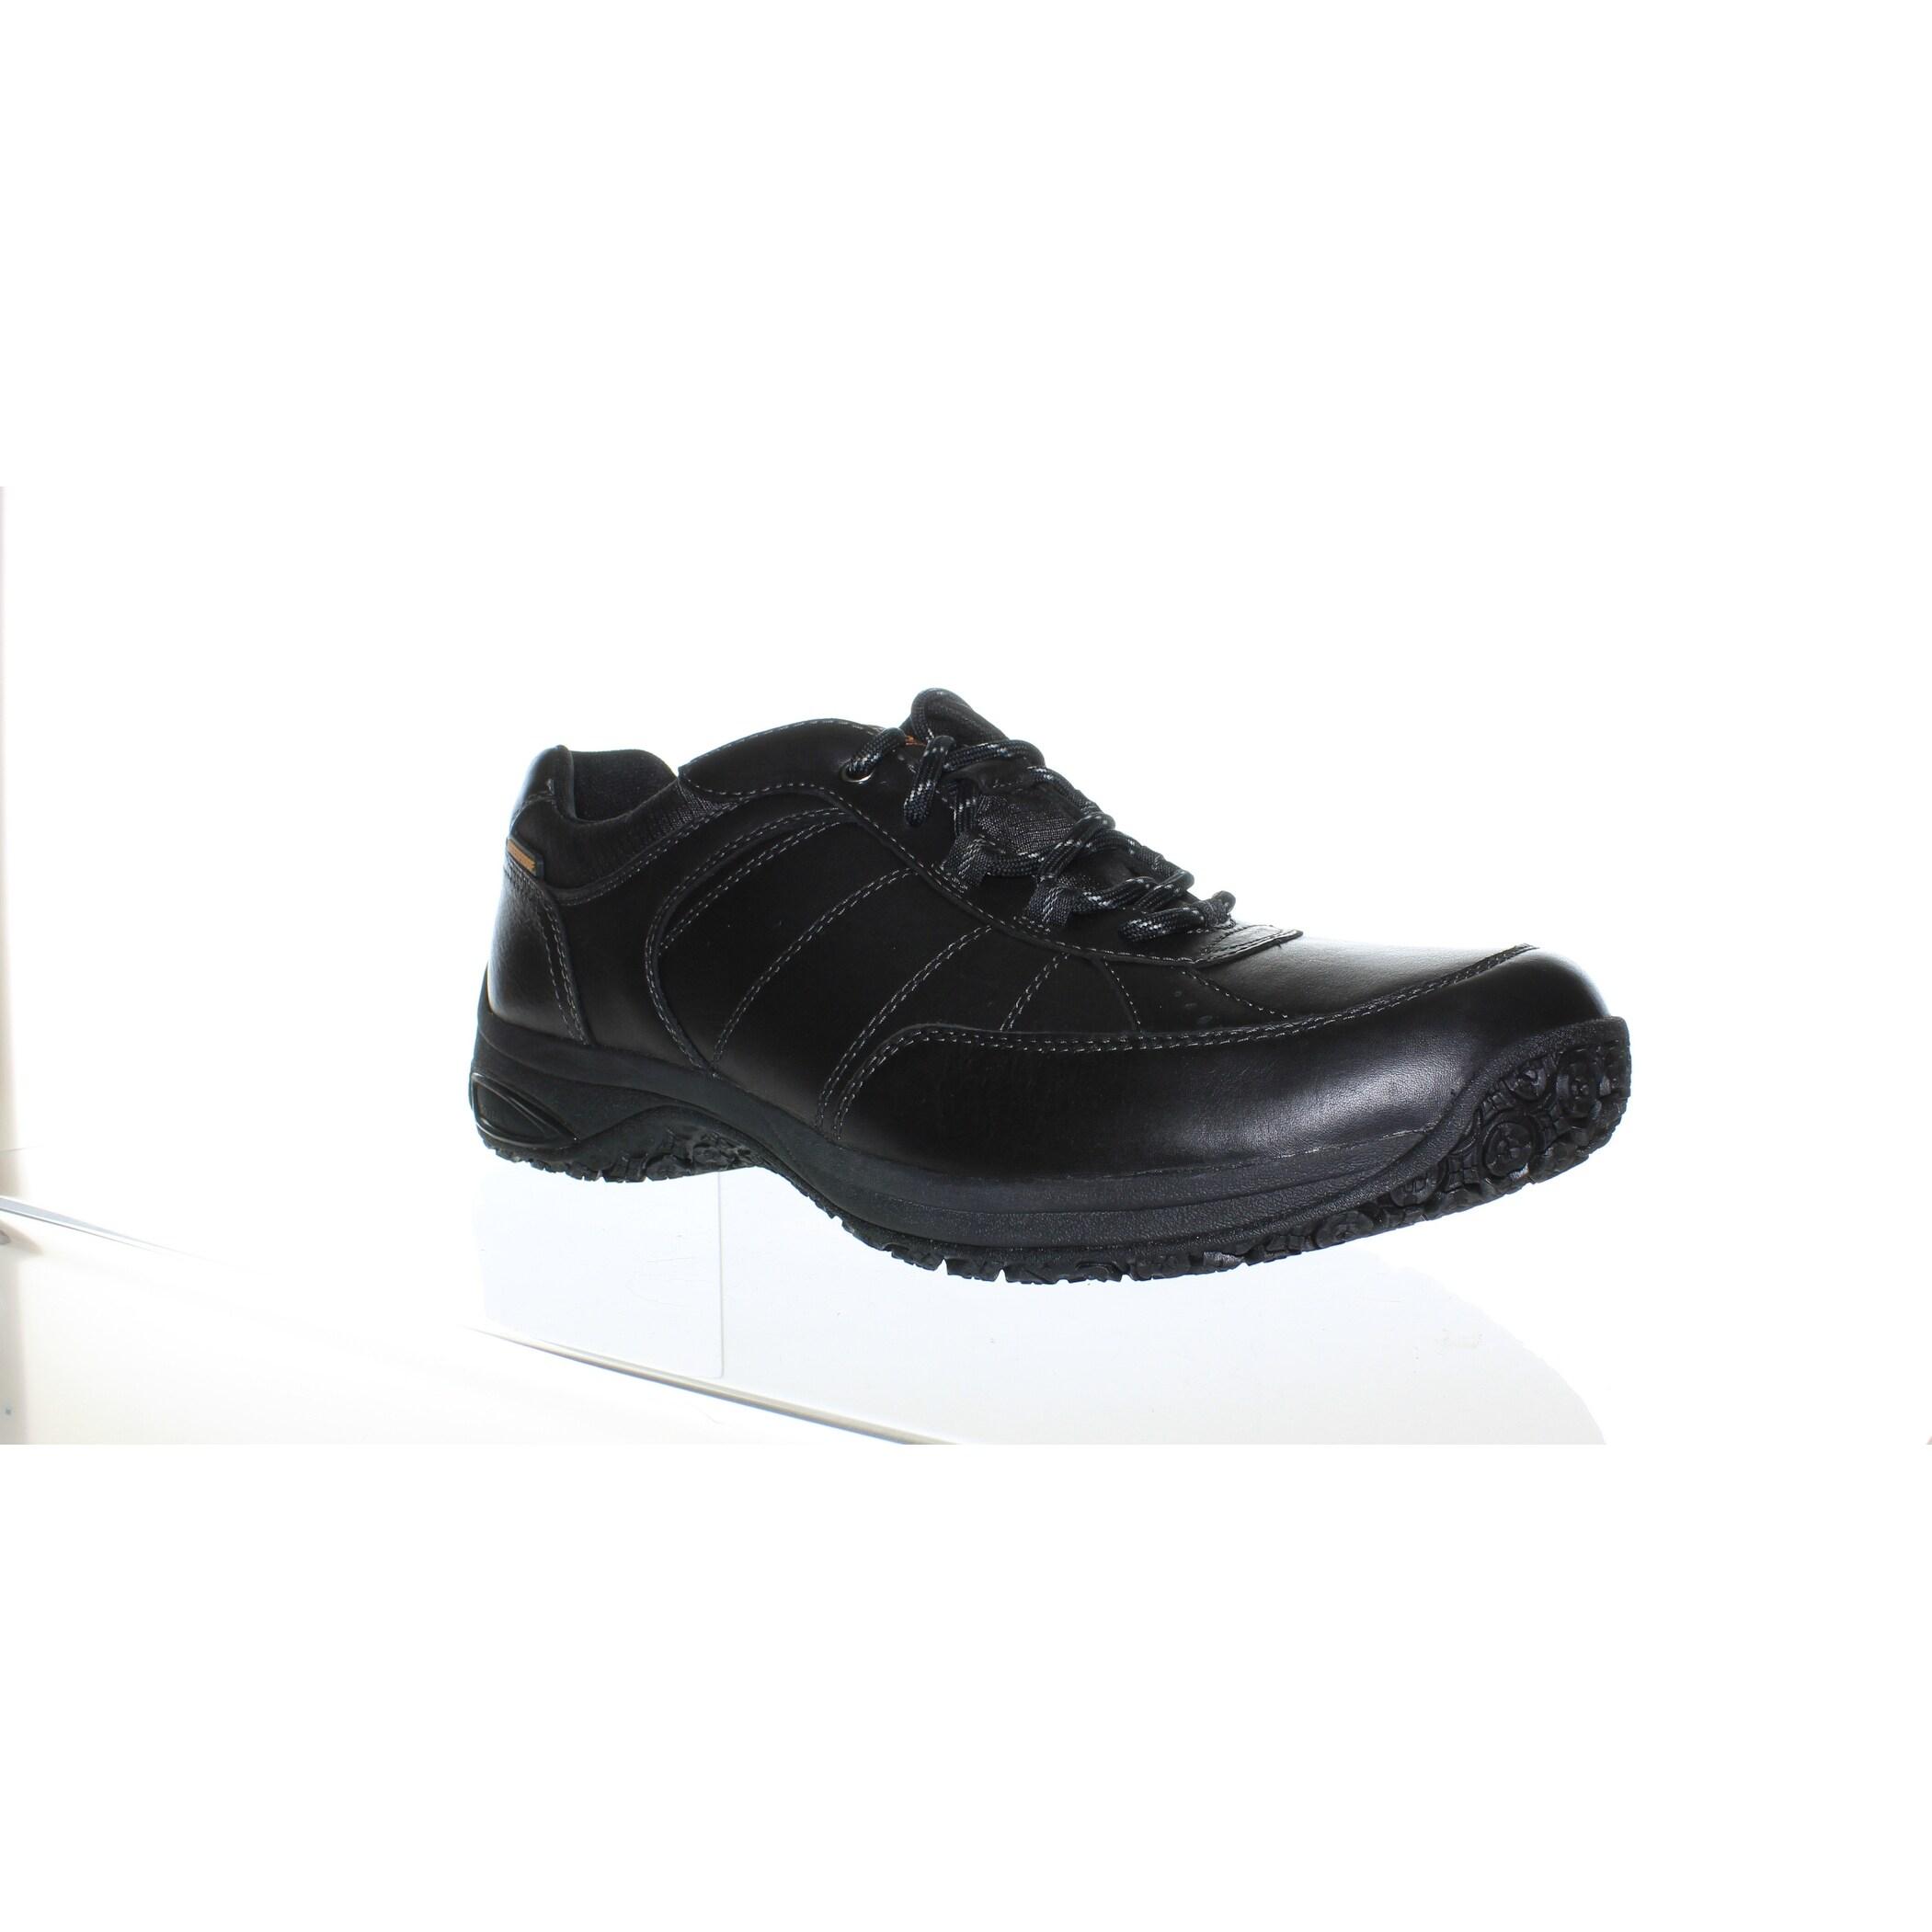 Dunham Dress Black Size Lexington Mens 15 Shoe Oxford BrCdxoWe